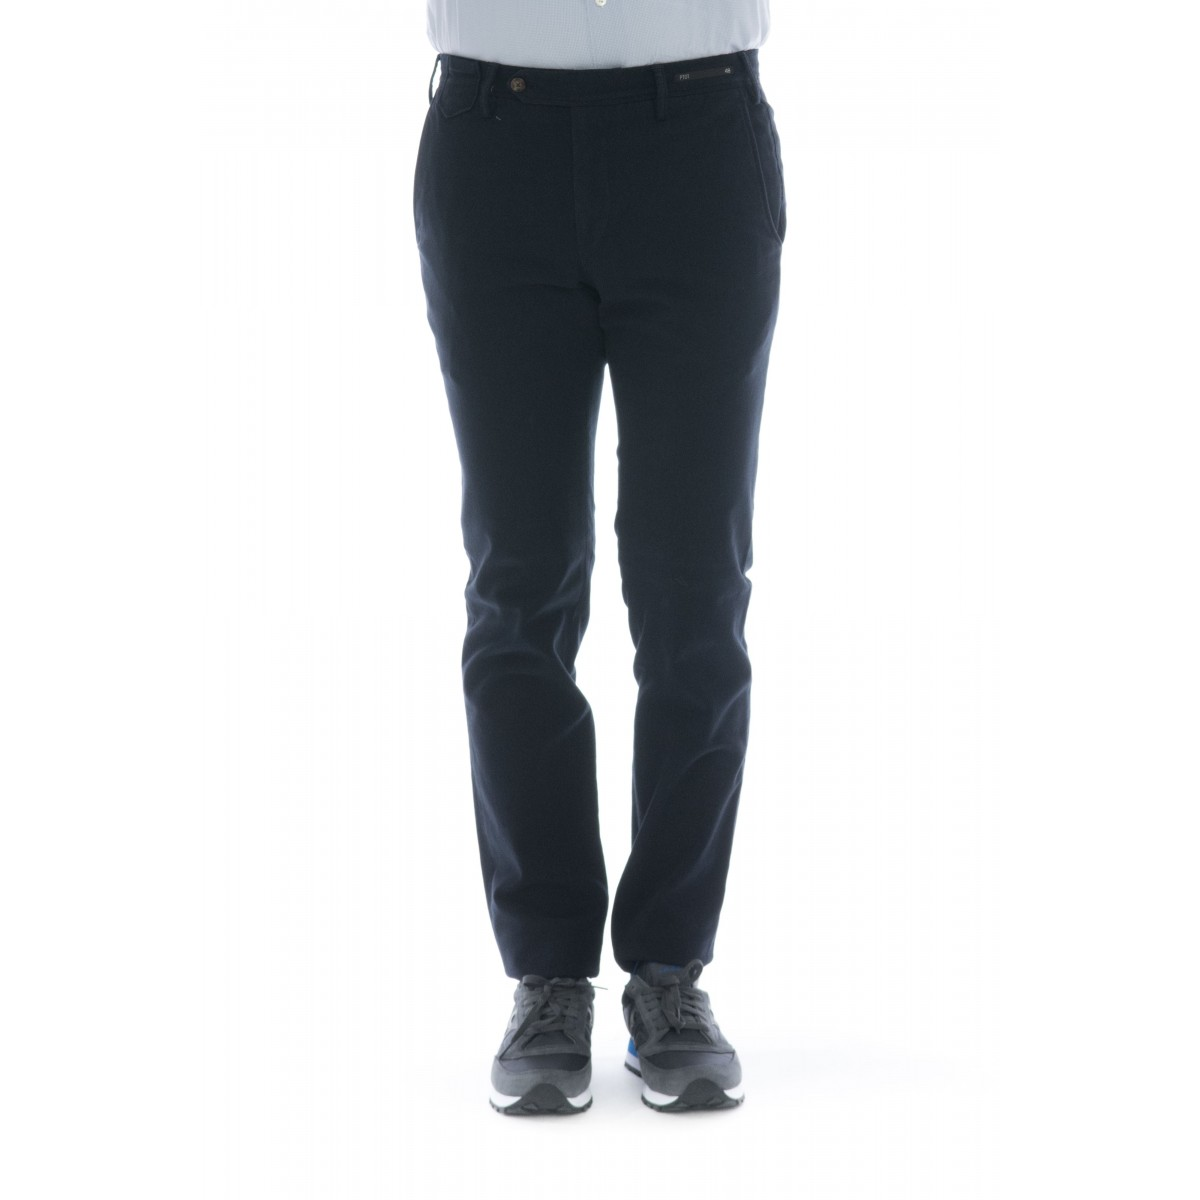 Pantalone uomo - Codl sd24 super slim cotone strech stampa